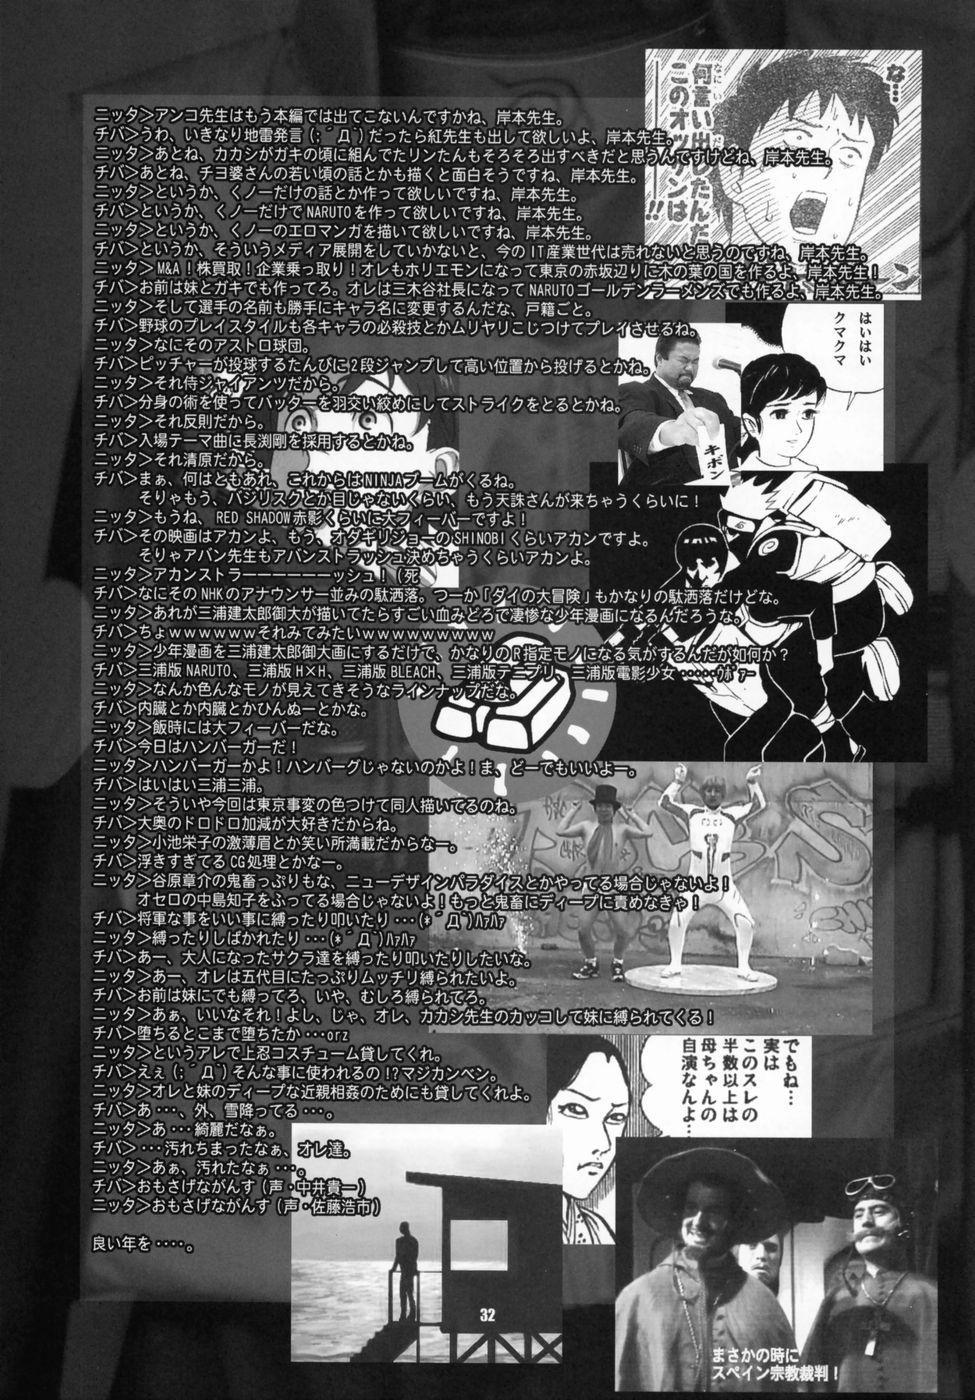 Himitsu - The Secret 31